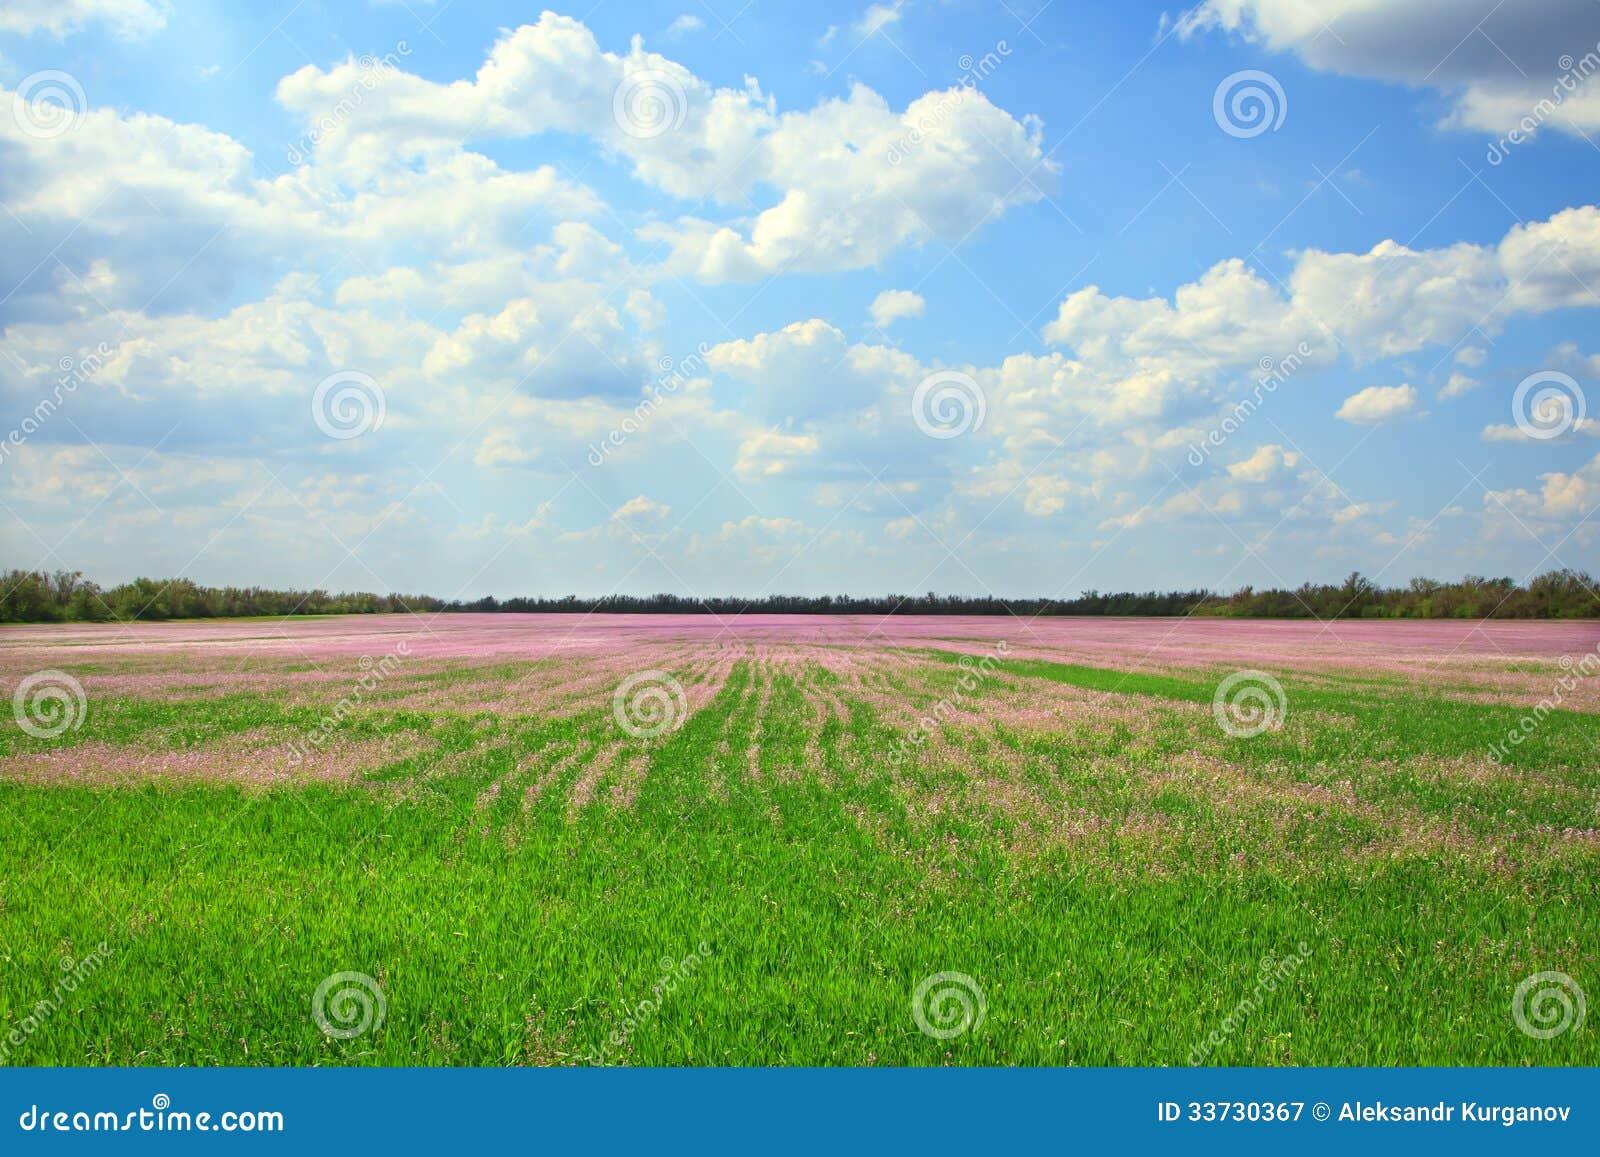 Красивый ландшафт поля лаванды